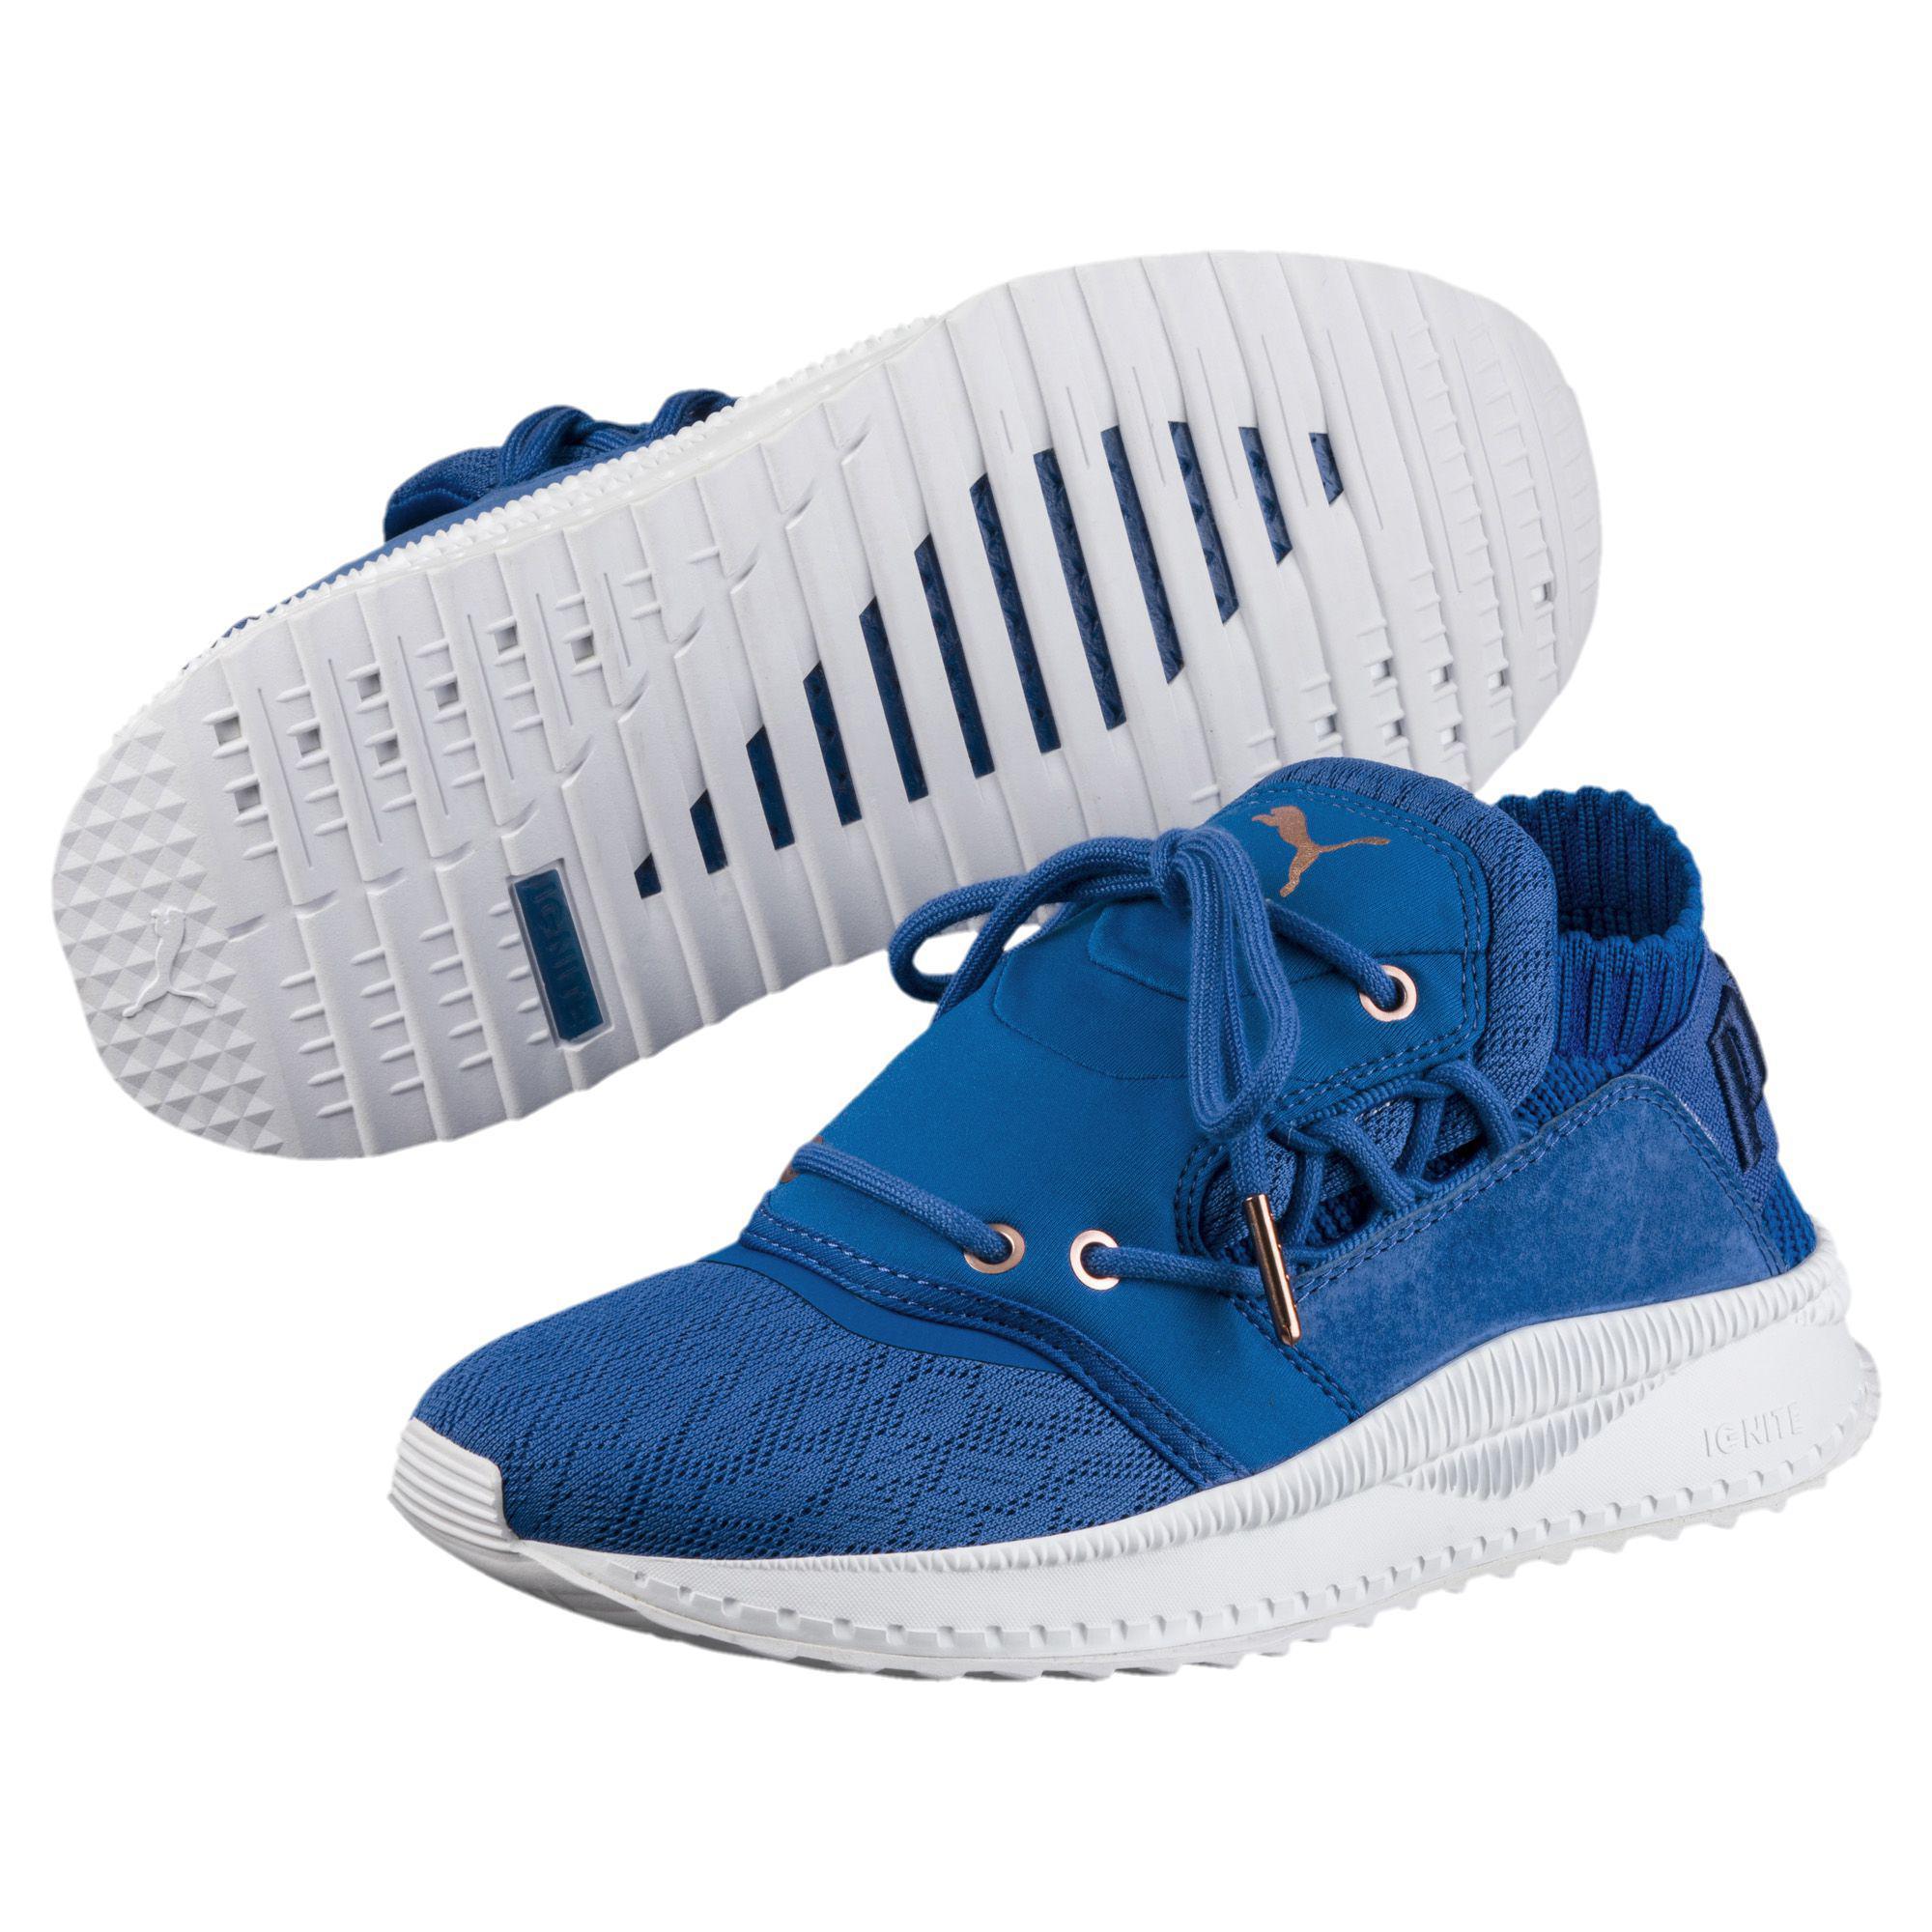 Lyst - PUMA Tsugi Shinsei Women s Training Shoes in Blue 820ae3e69